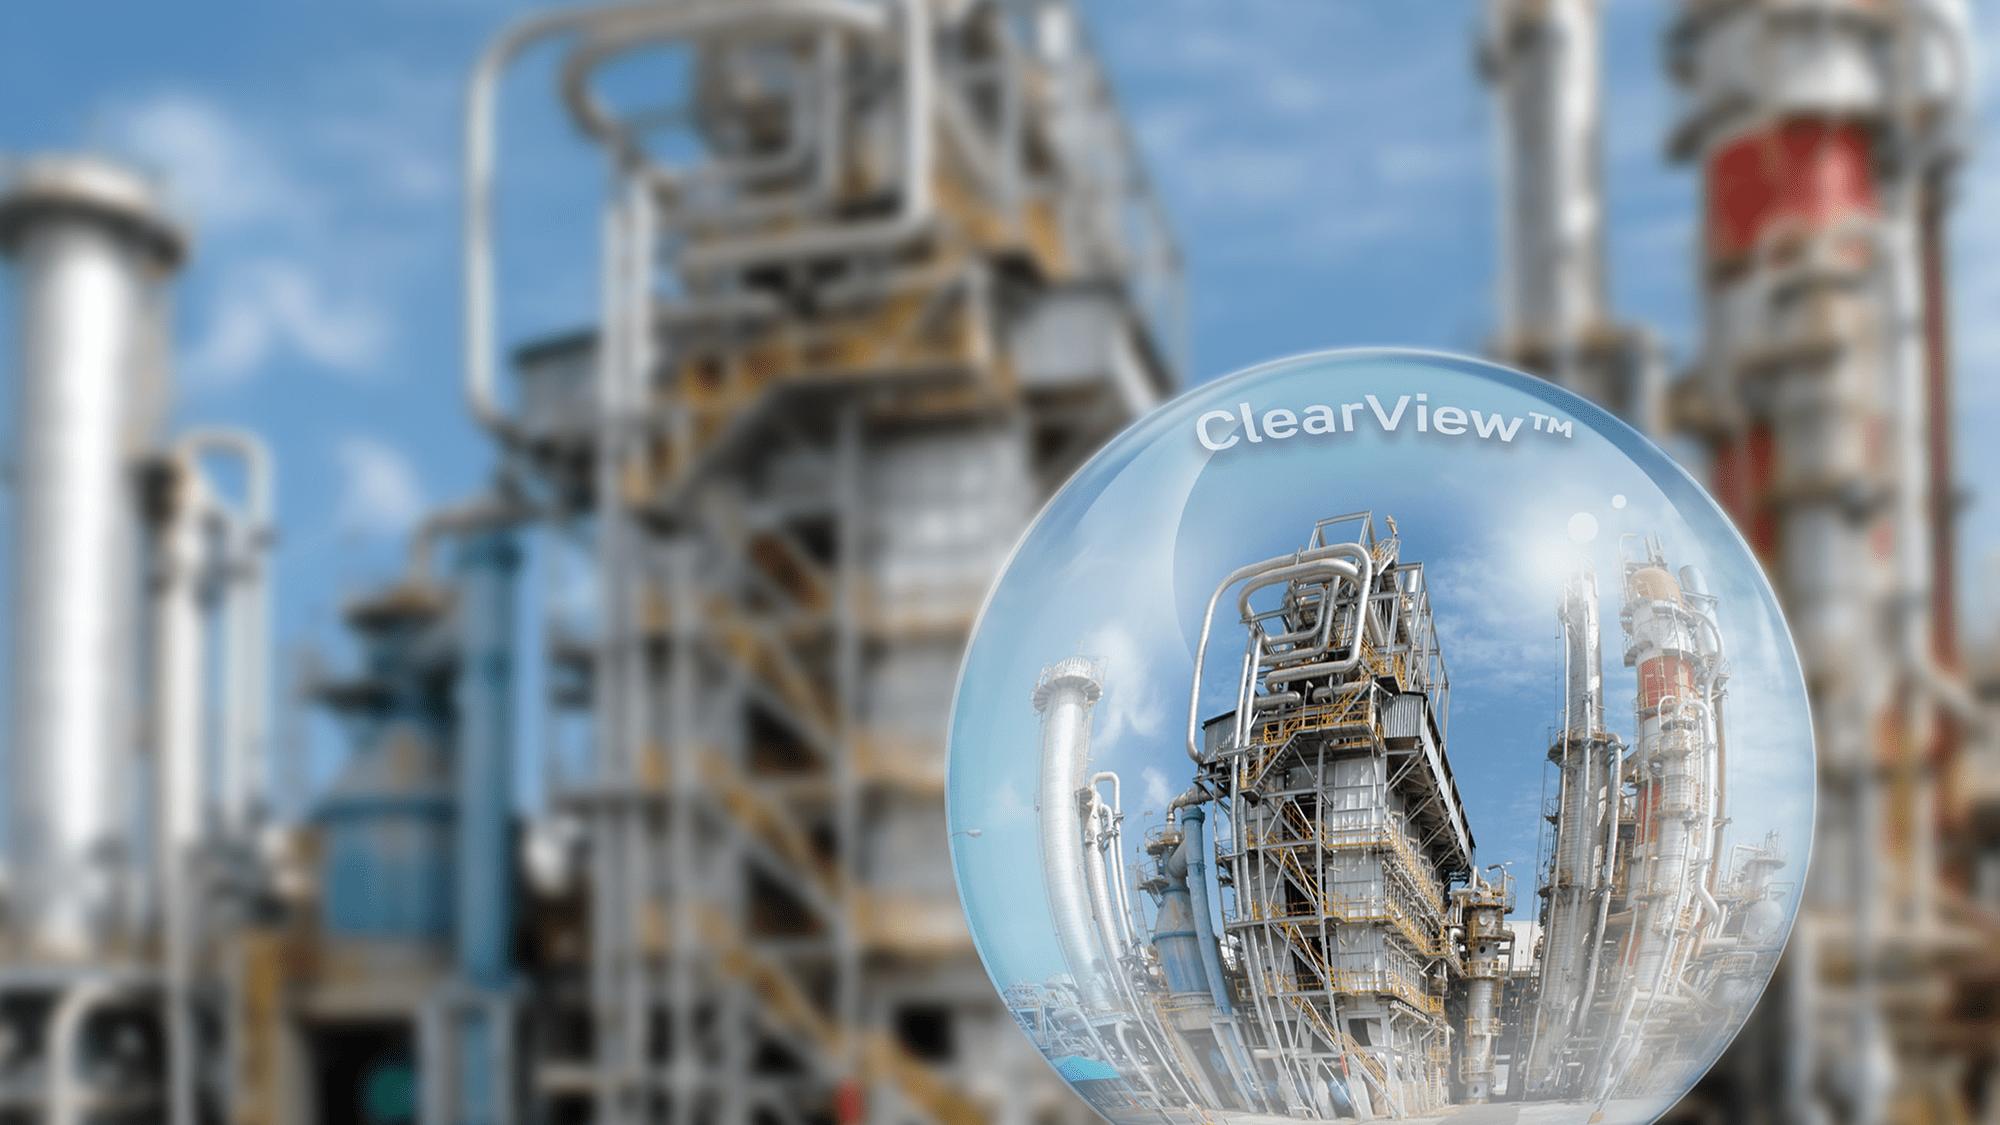 ClearviewProdukt_Featured-image_Portrait